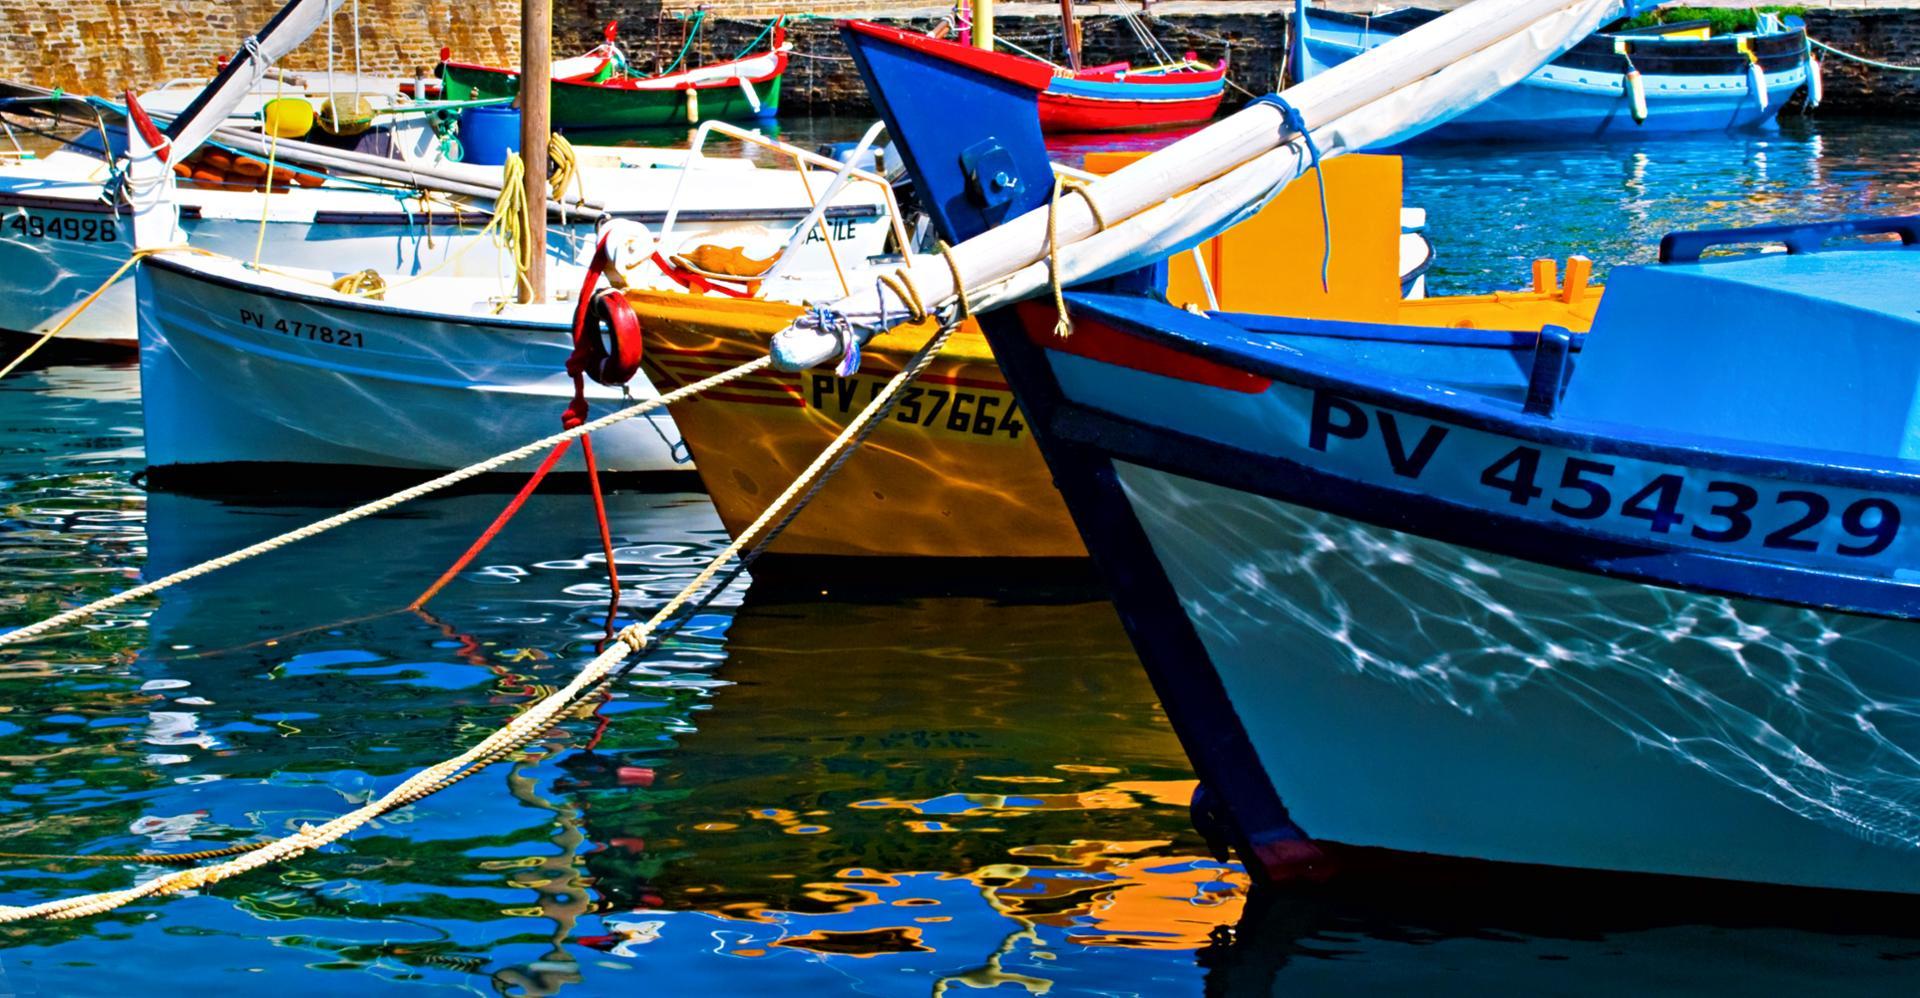 Les barques de Collioure (66)